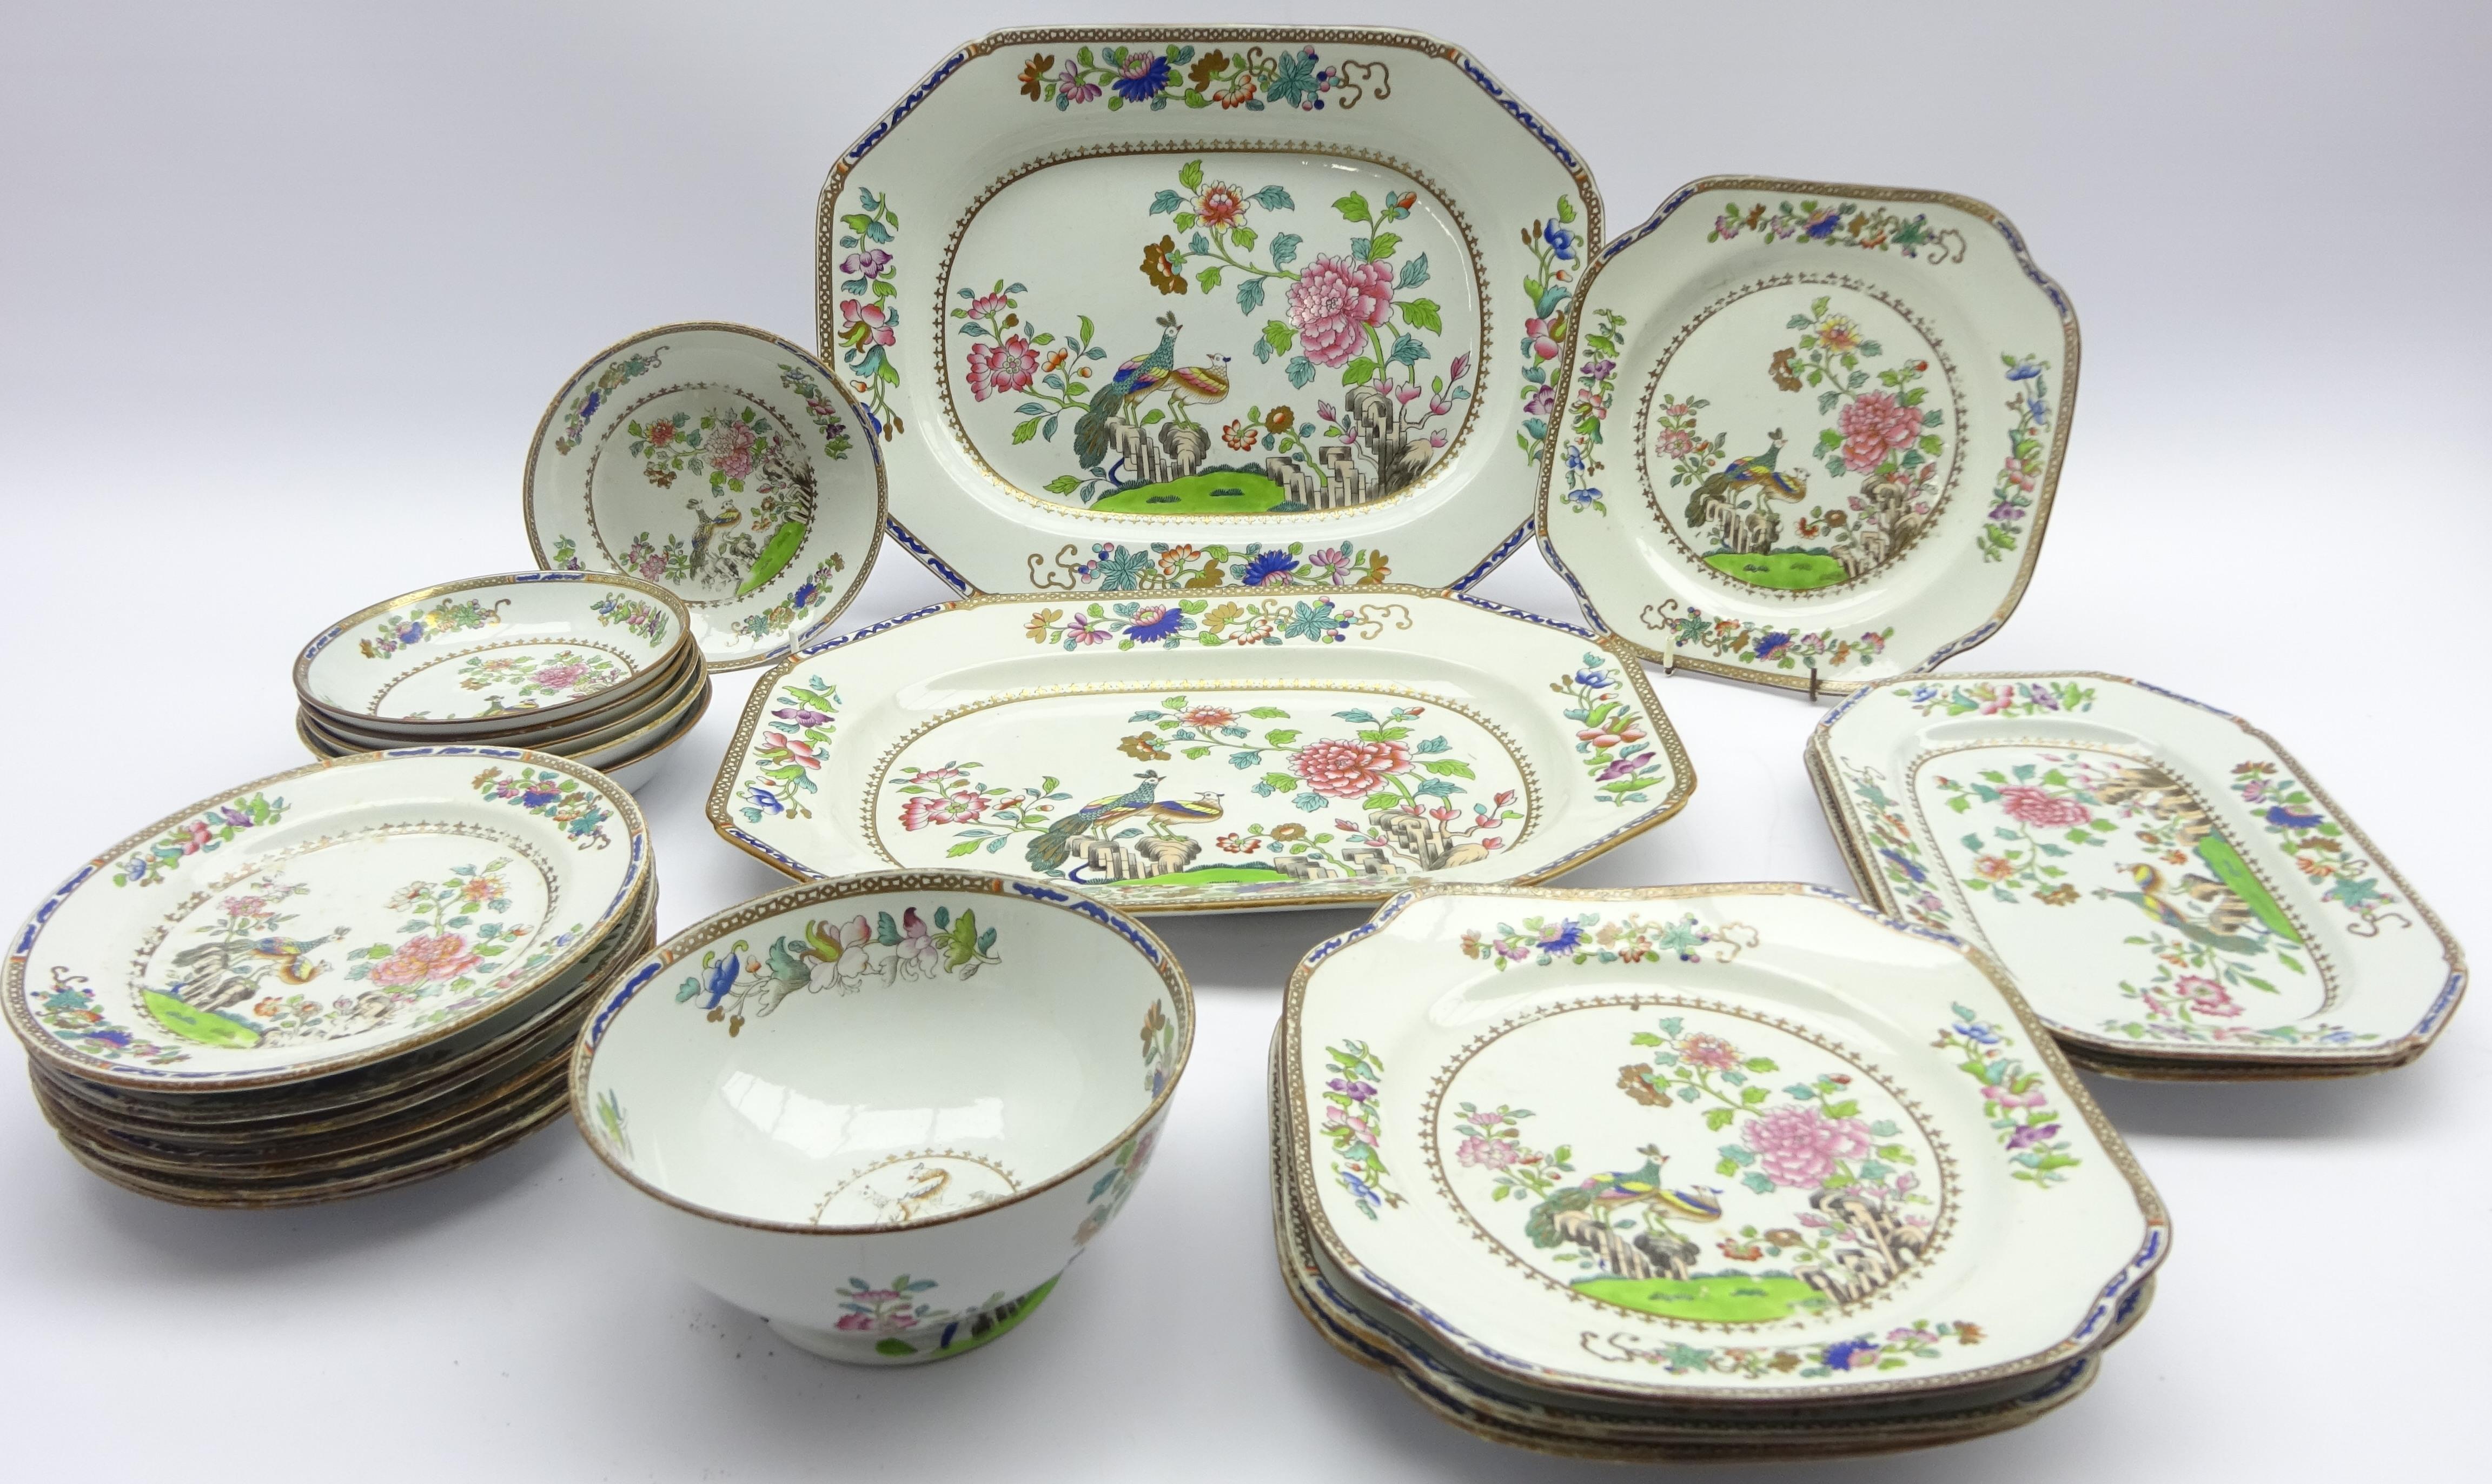 Lot 37 - Early 19th century Copeland & Garrett and similar Chinoiserie pattern tableware (22)